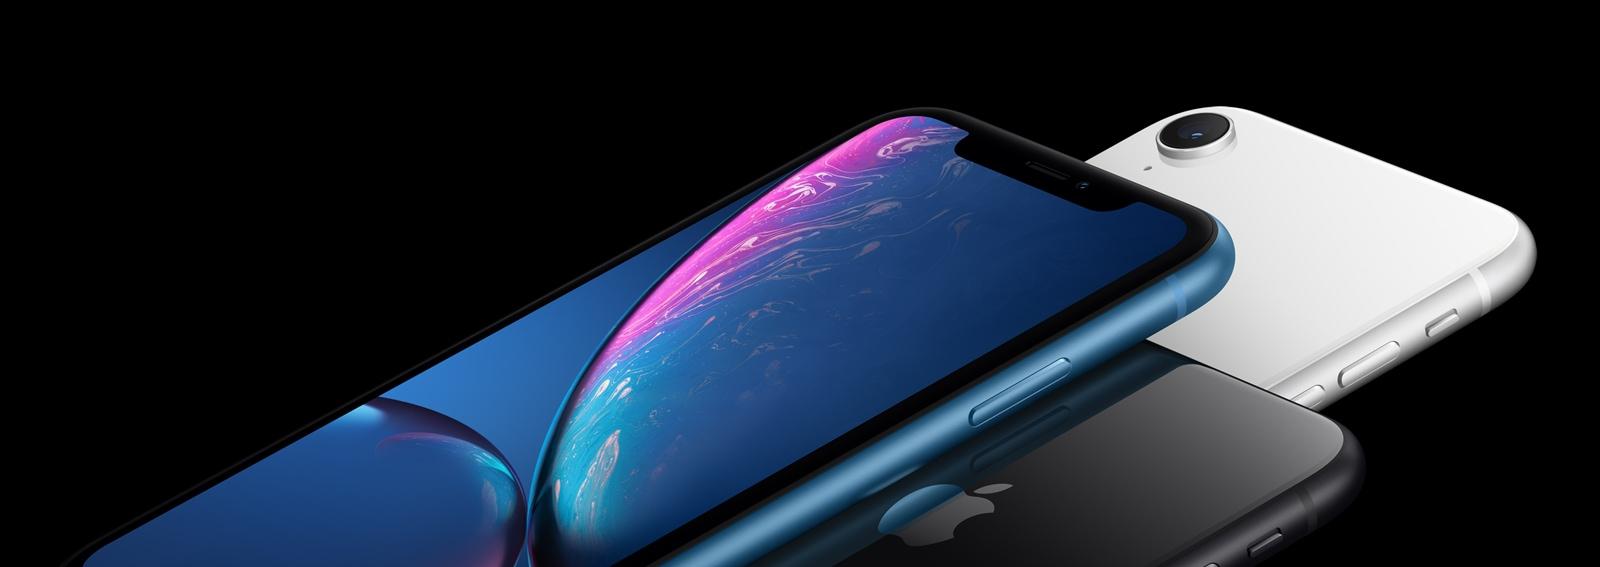 iphone xr desktop